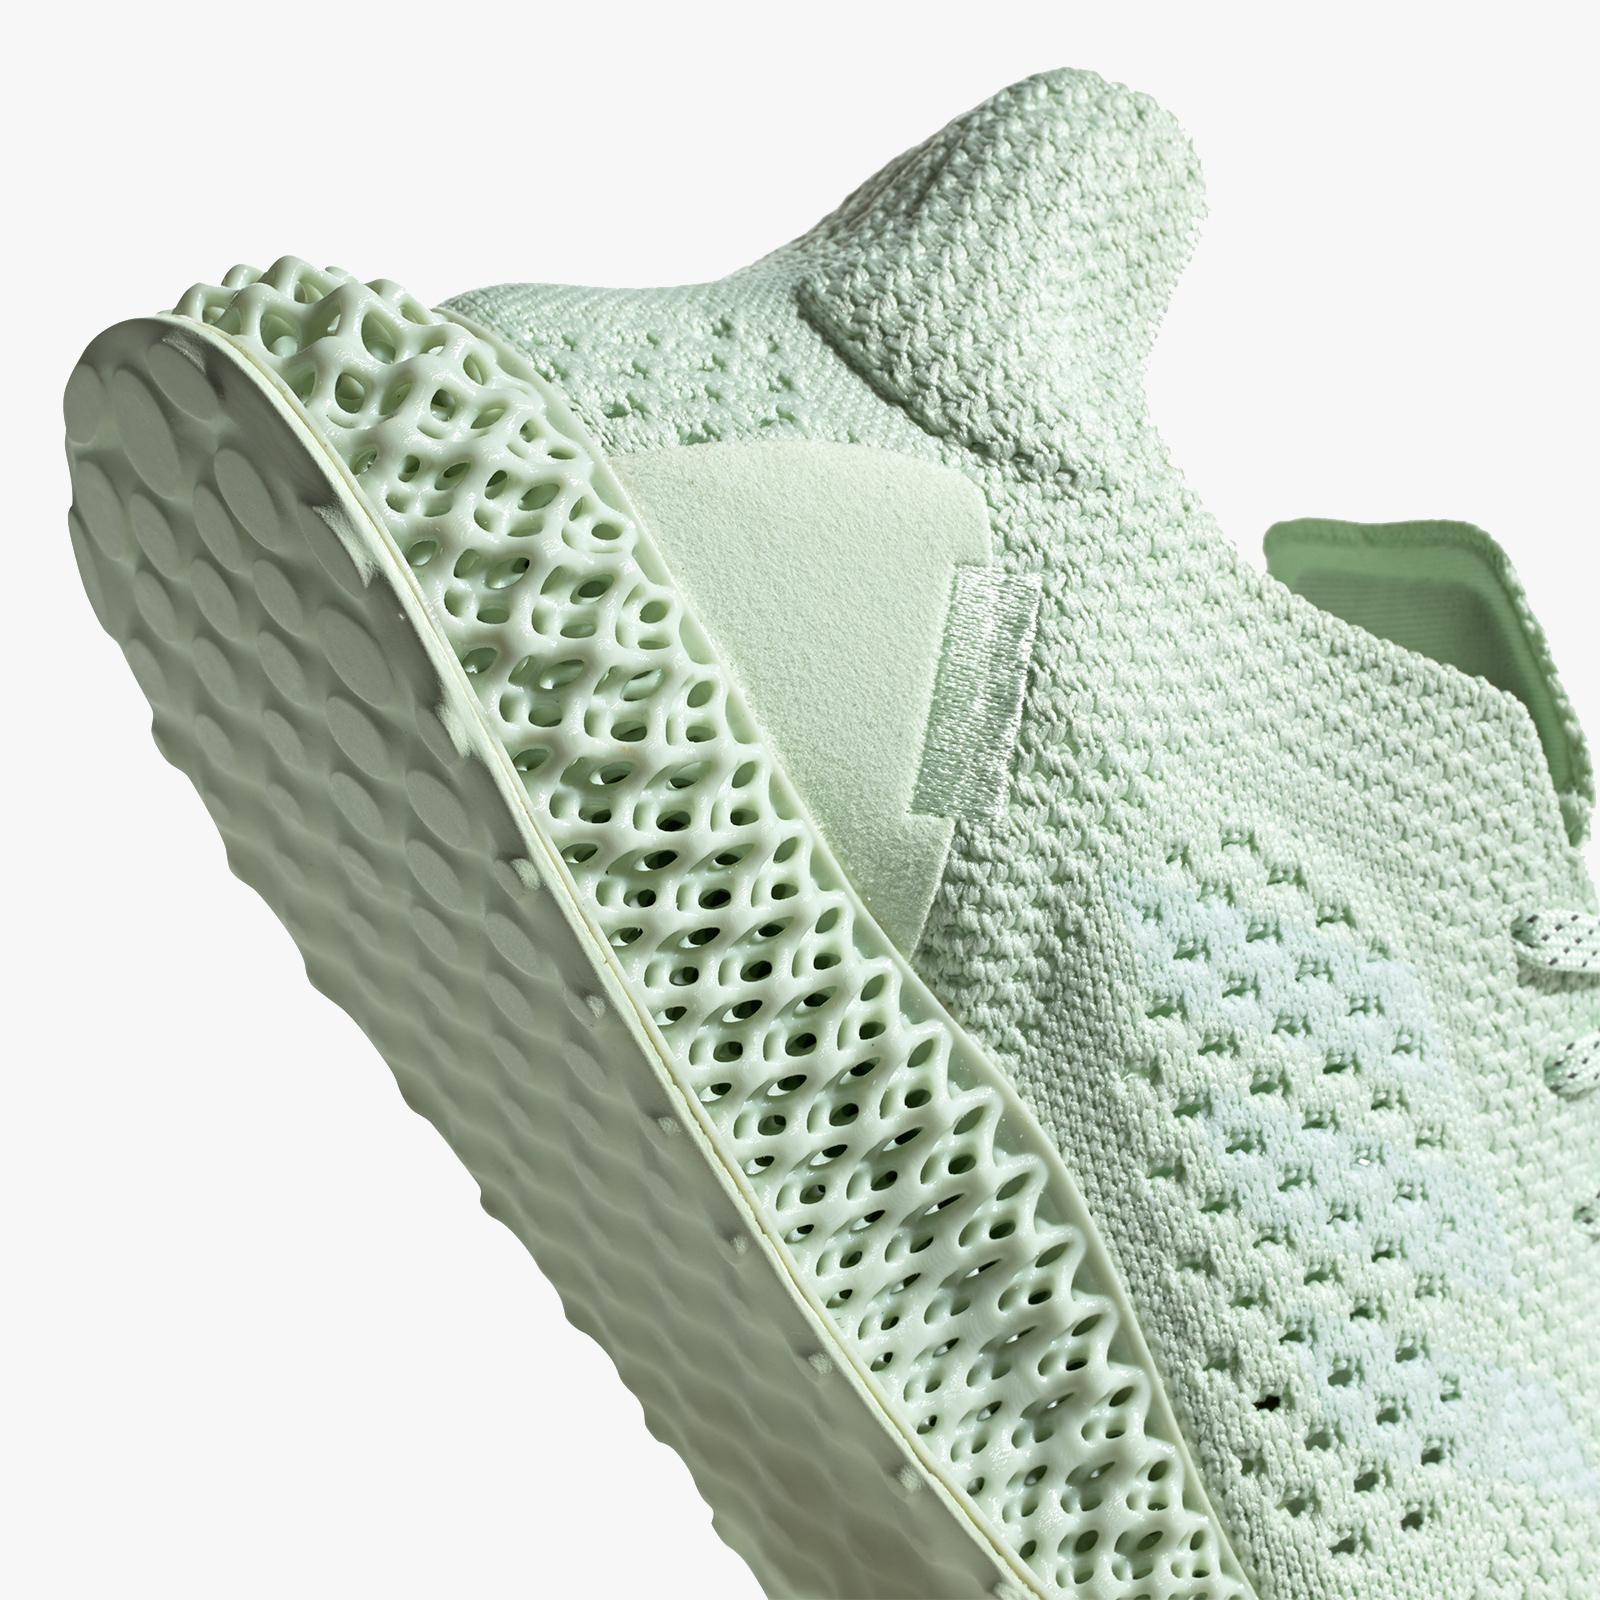 new concept 0233a f8bc8 ... adidas Consortium Future Runner 4D x Daniel Arsham